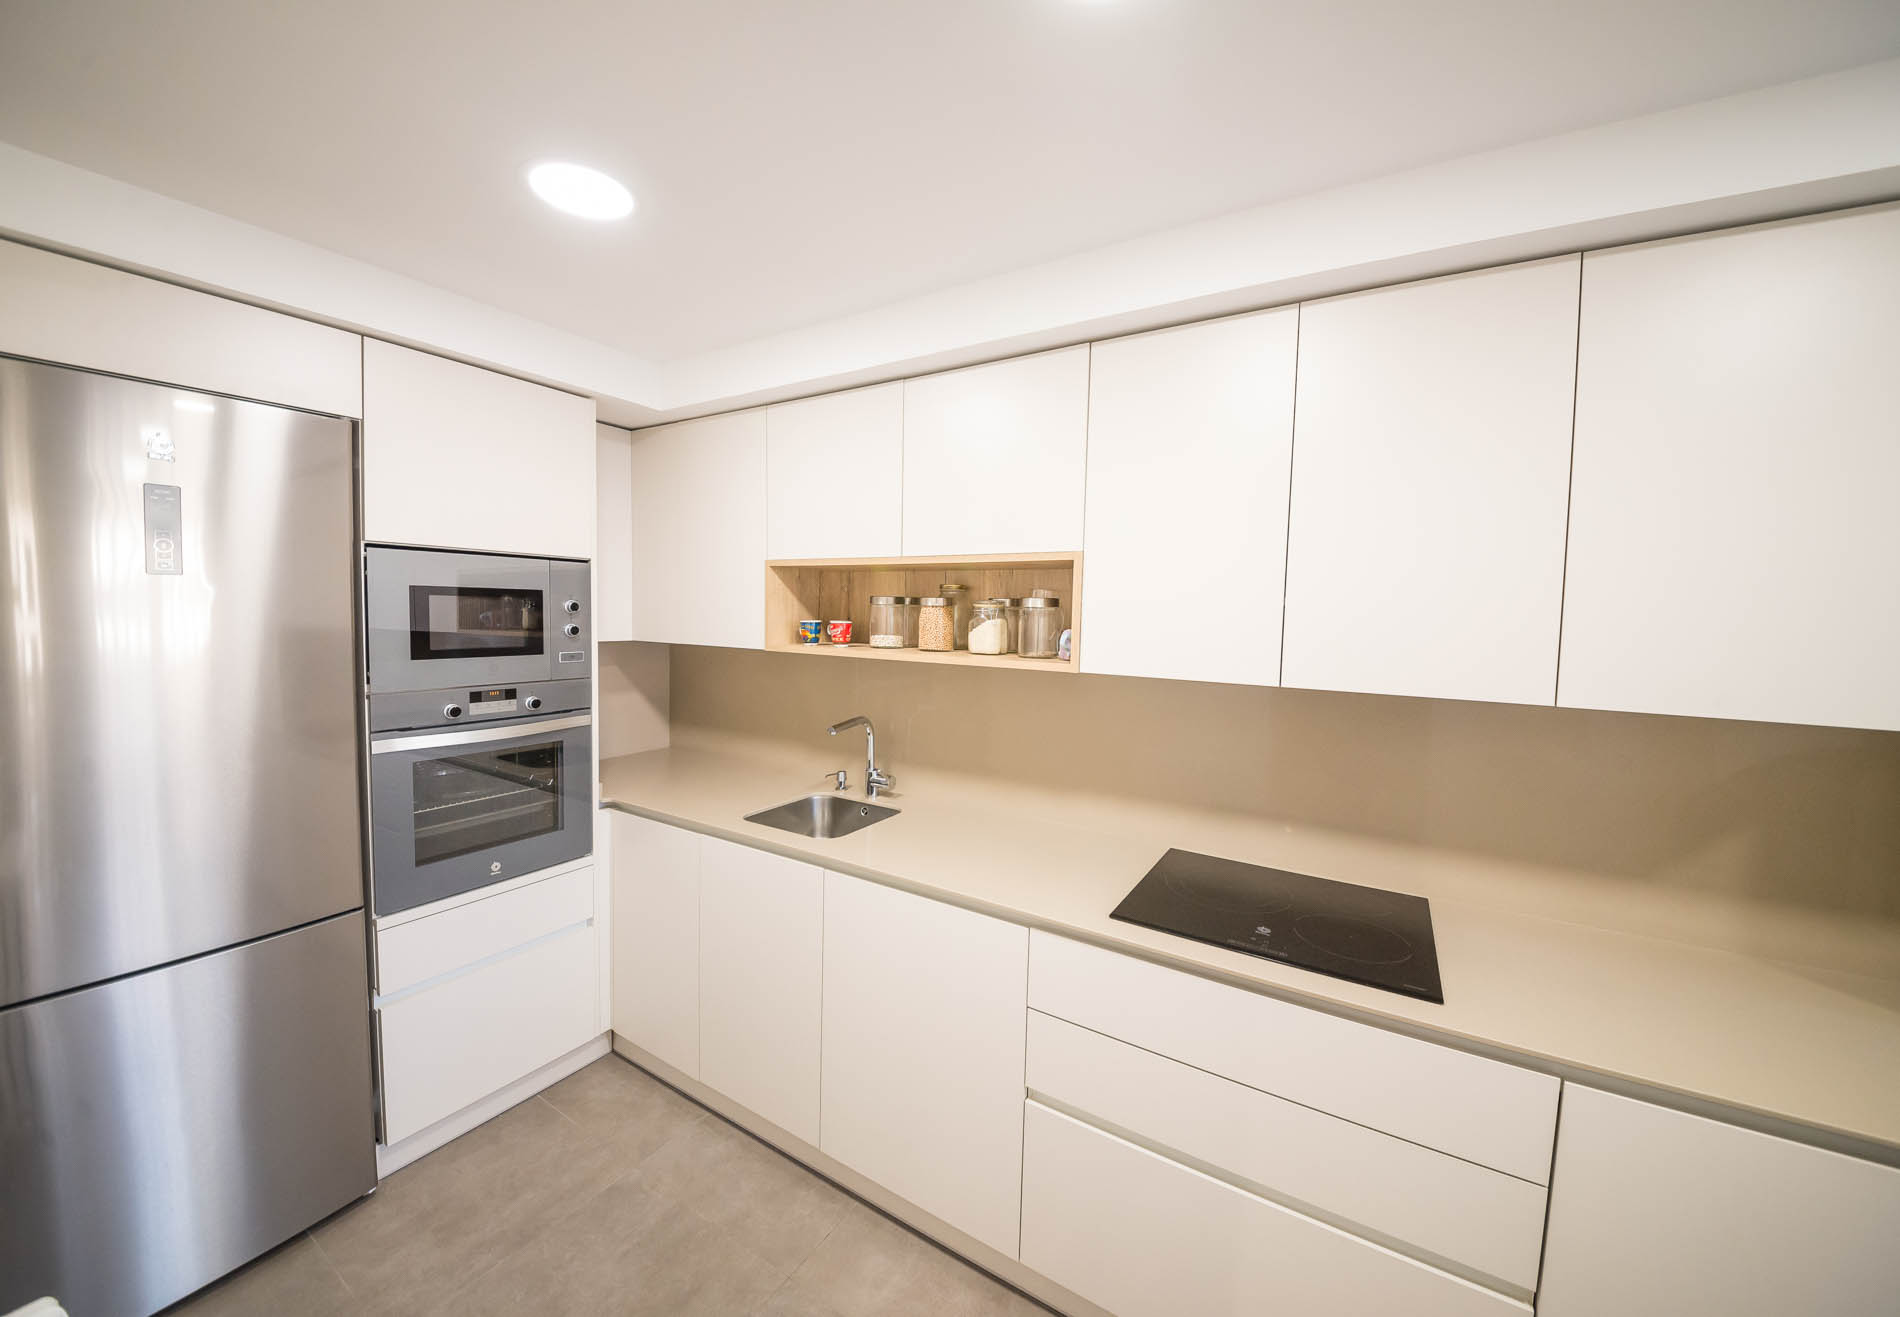 Reforma integral de piso en Zaragoza - Proyecto Gómez Laguna por COTA ZETA